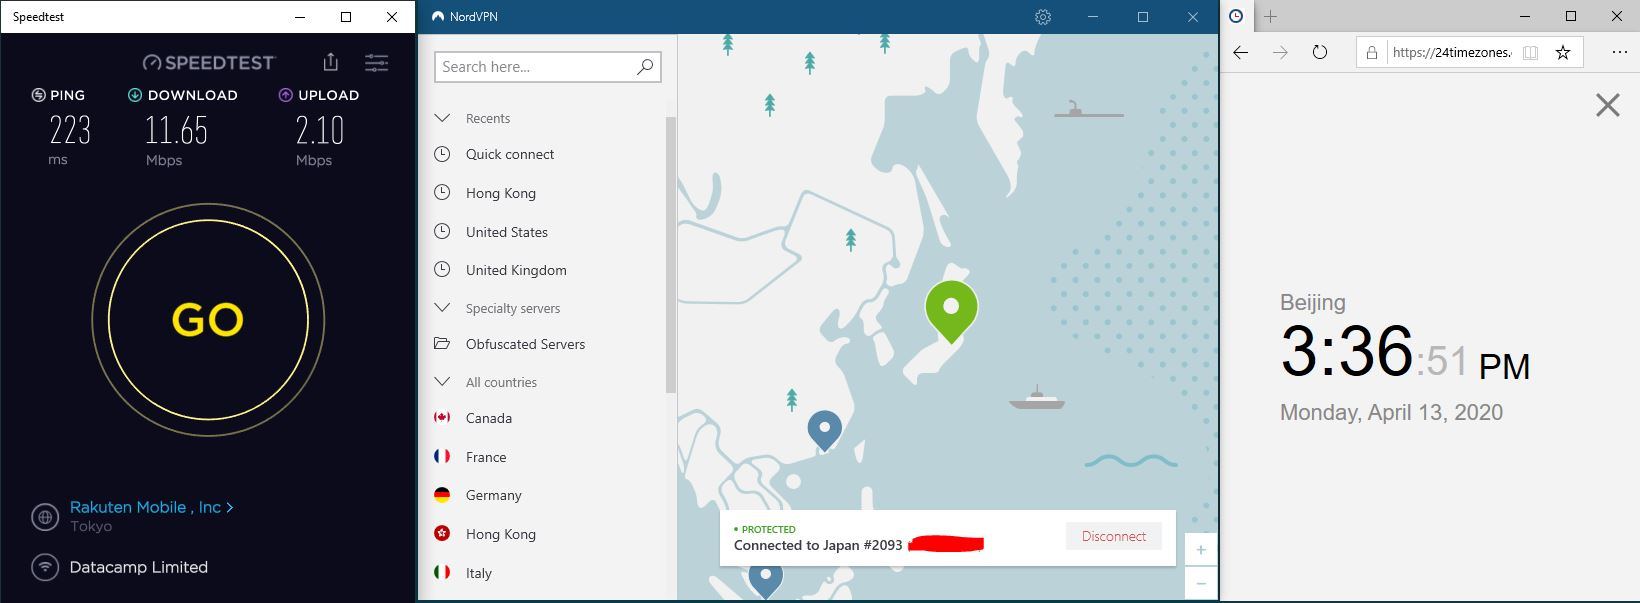 Windows10 NordVPNVPN Japan #2093 中国VPN 翻墙 科学上网 SpeedTest测速-20200413